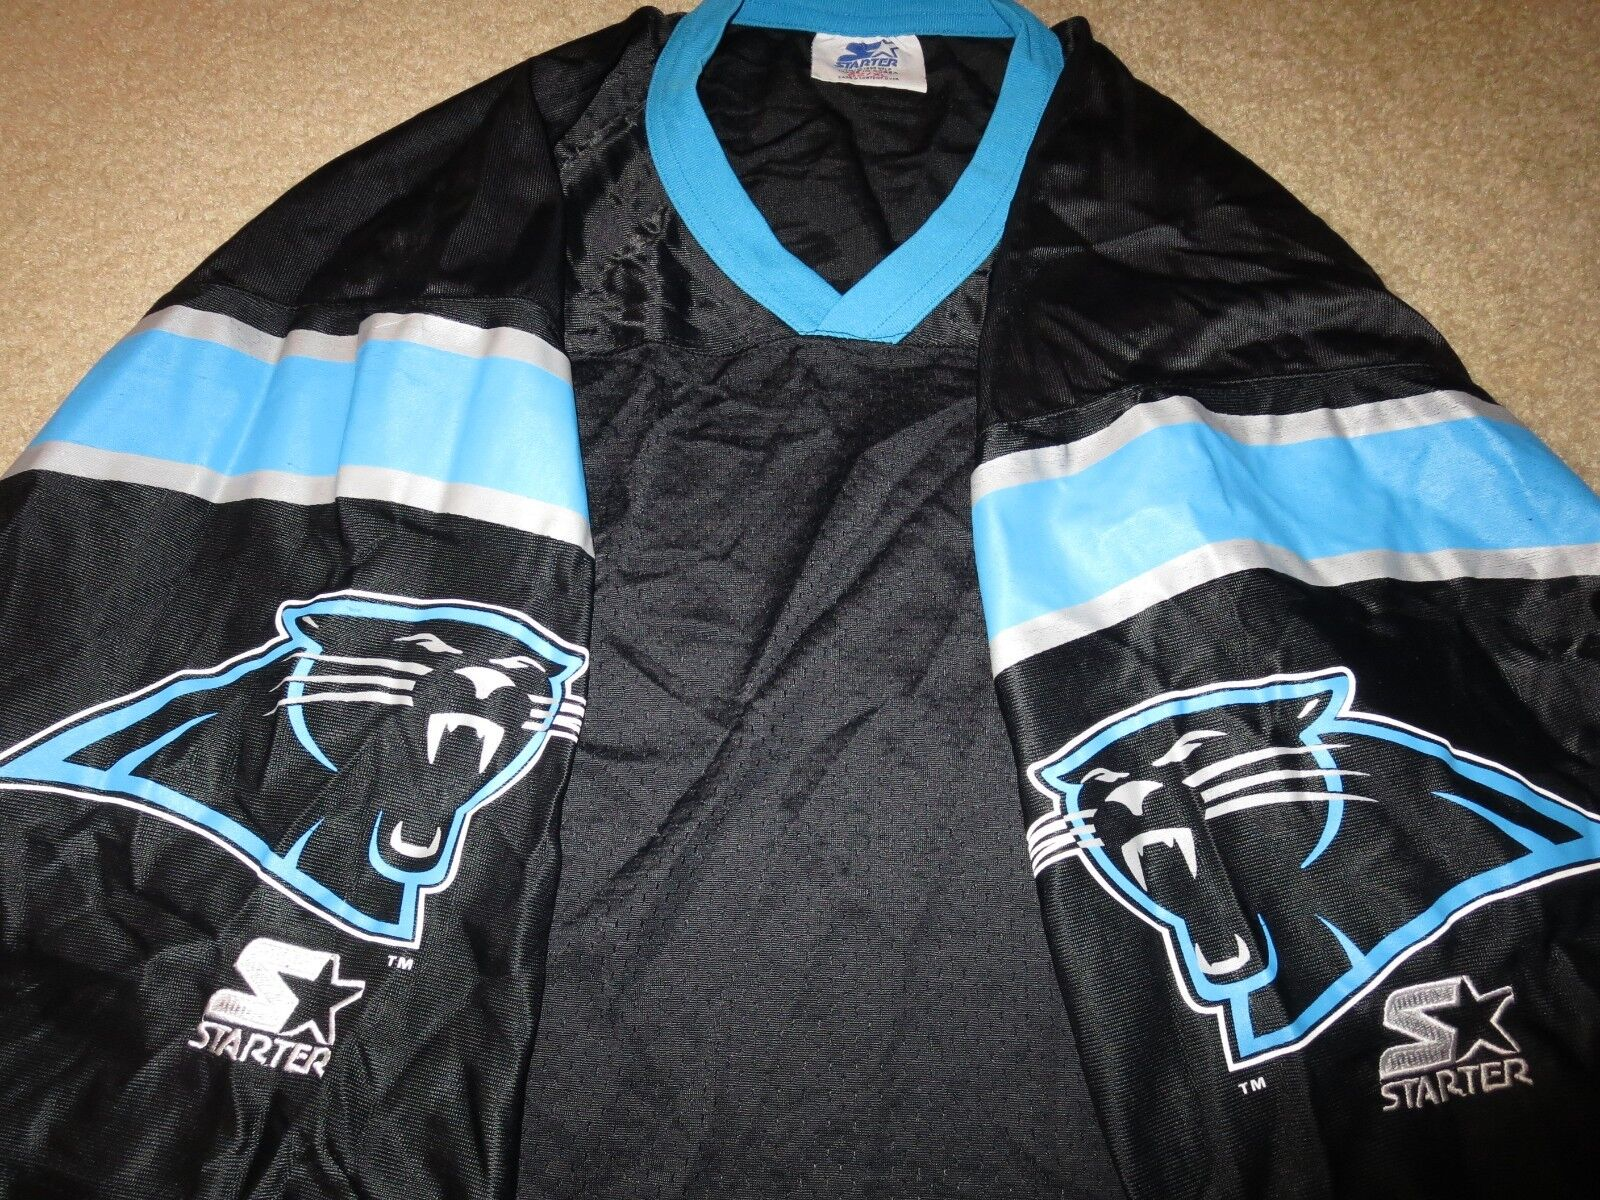 Carolina Panthers Super Bowl Schwarz Starter NFL Trikot XL 52